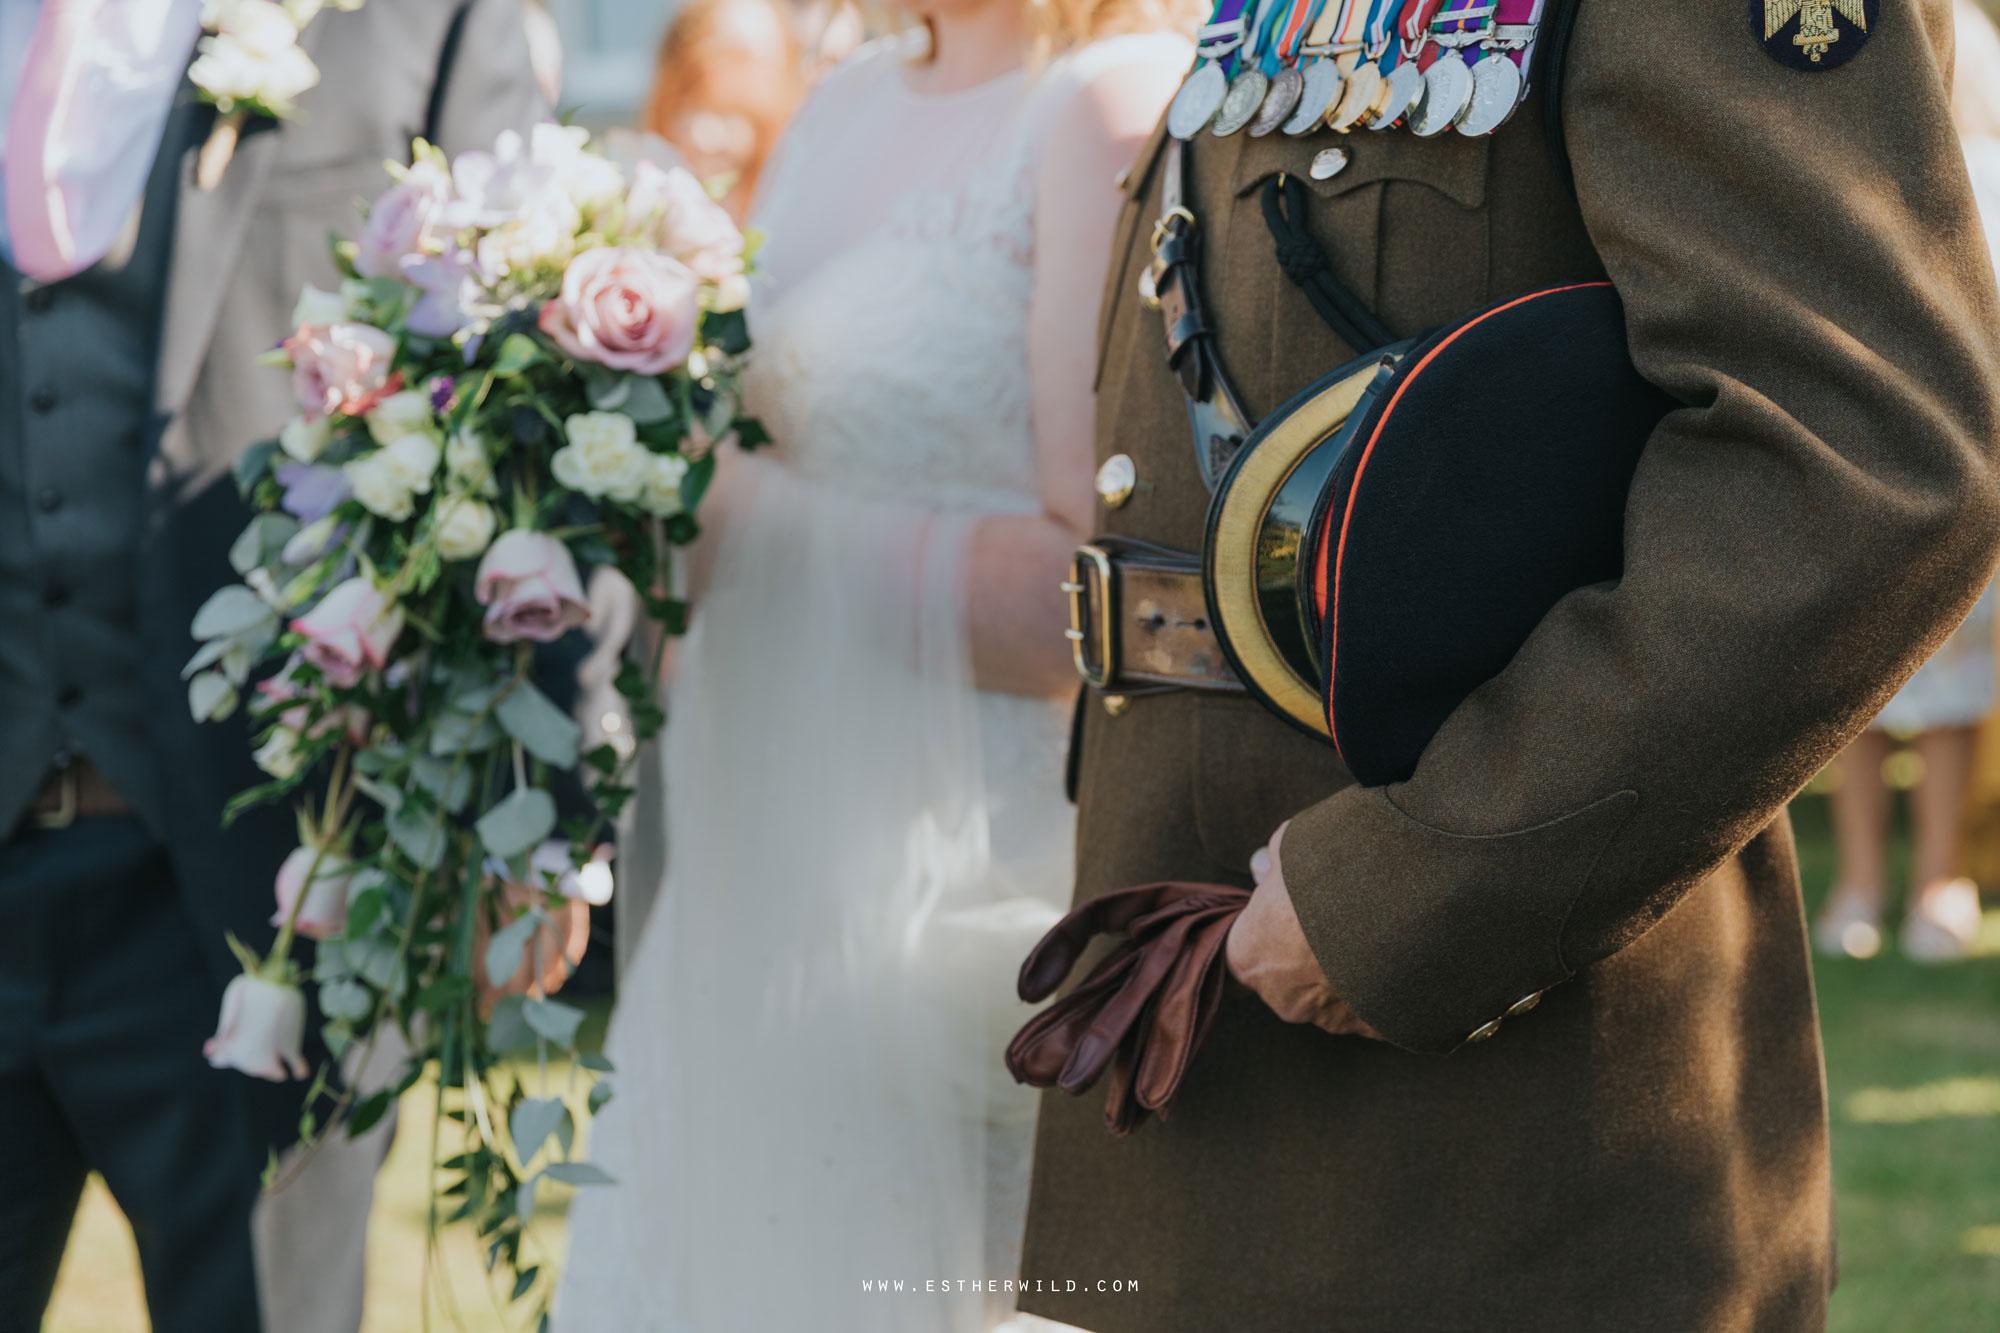 Cromer_Wedding_Beach_Outdoor_Ceremony_Norfolk_North_Lodge_Registry_Office_Rocket_House_Cafe_Cromer_Pier_IMG_3733.jpg